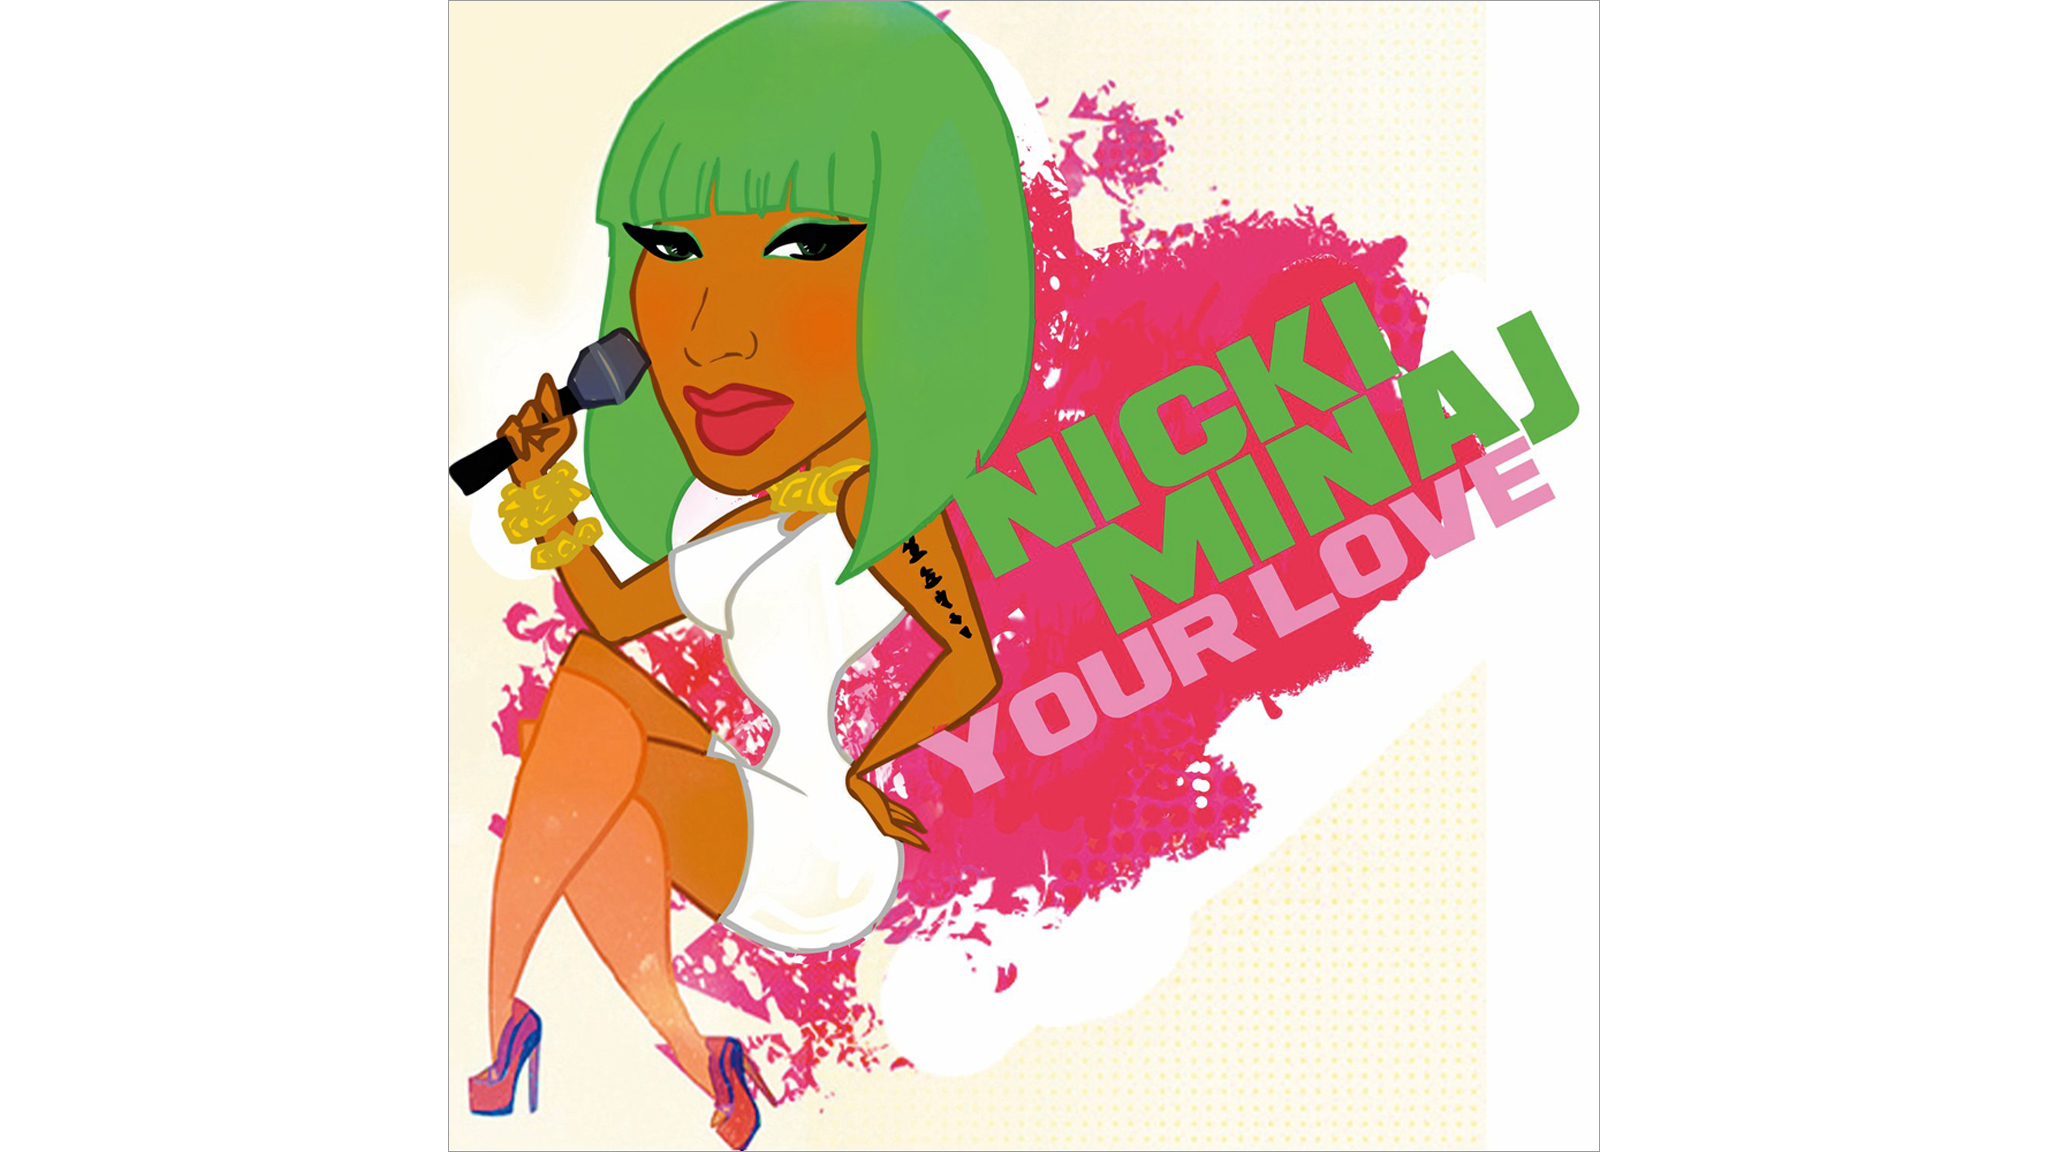 your love, nicki minaj